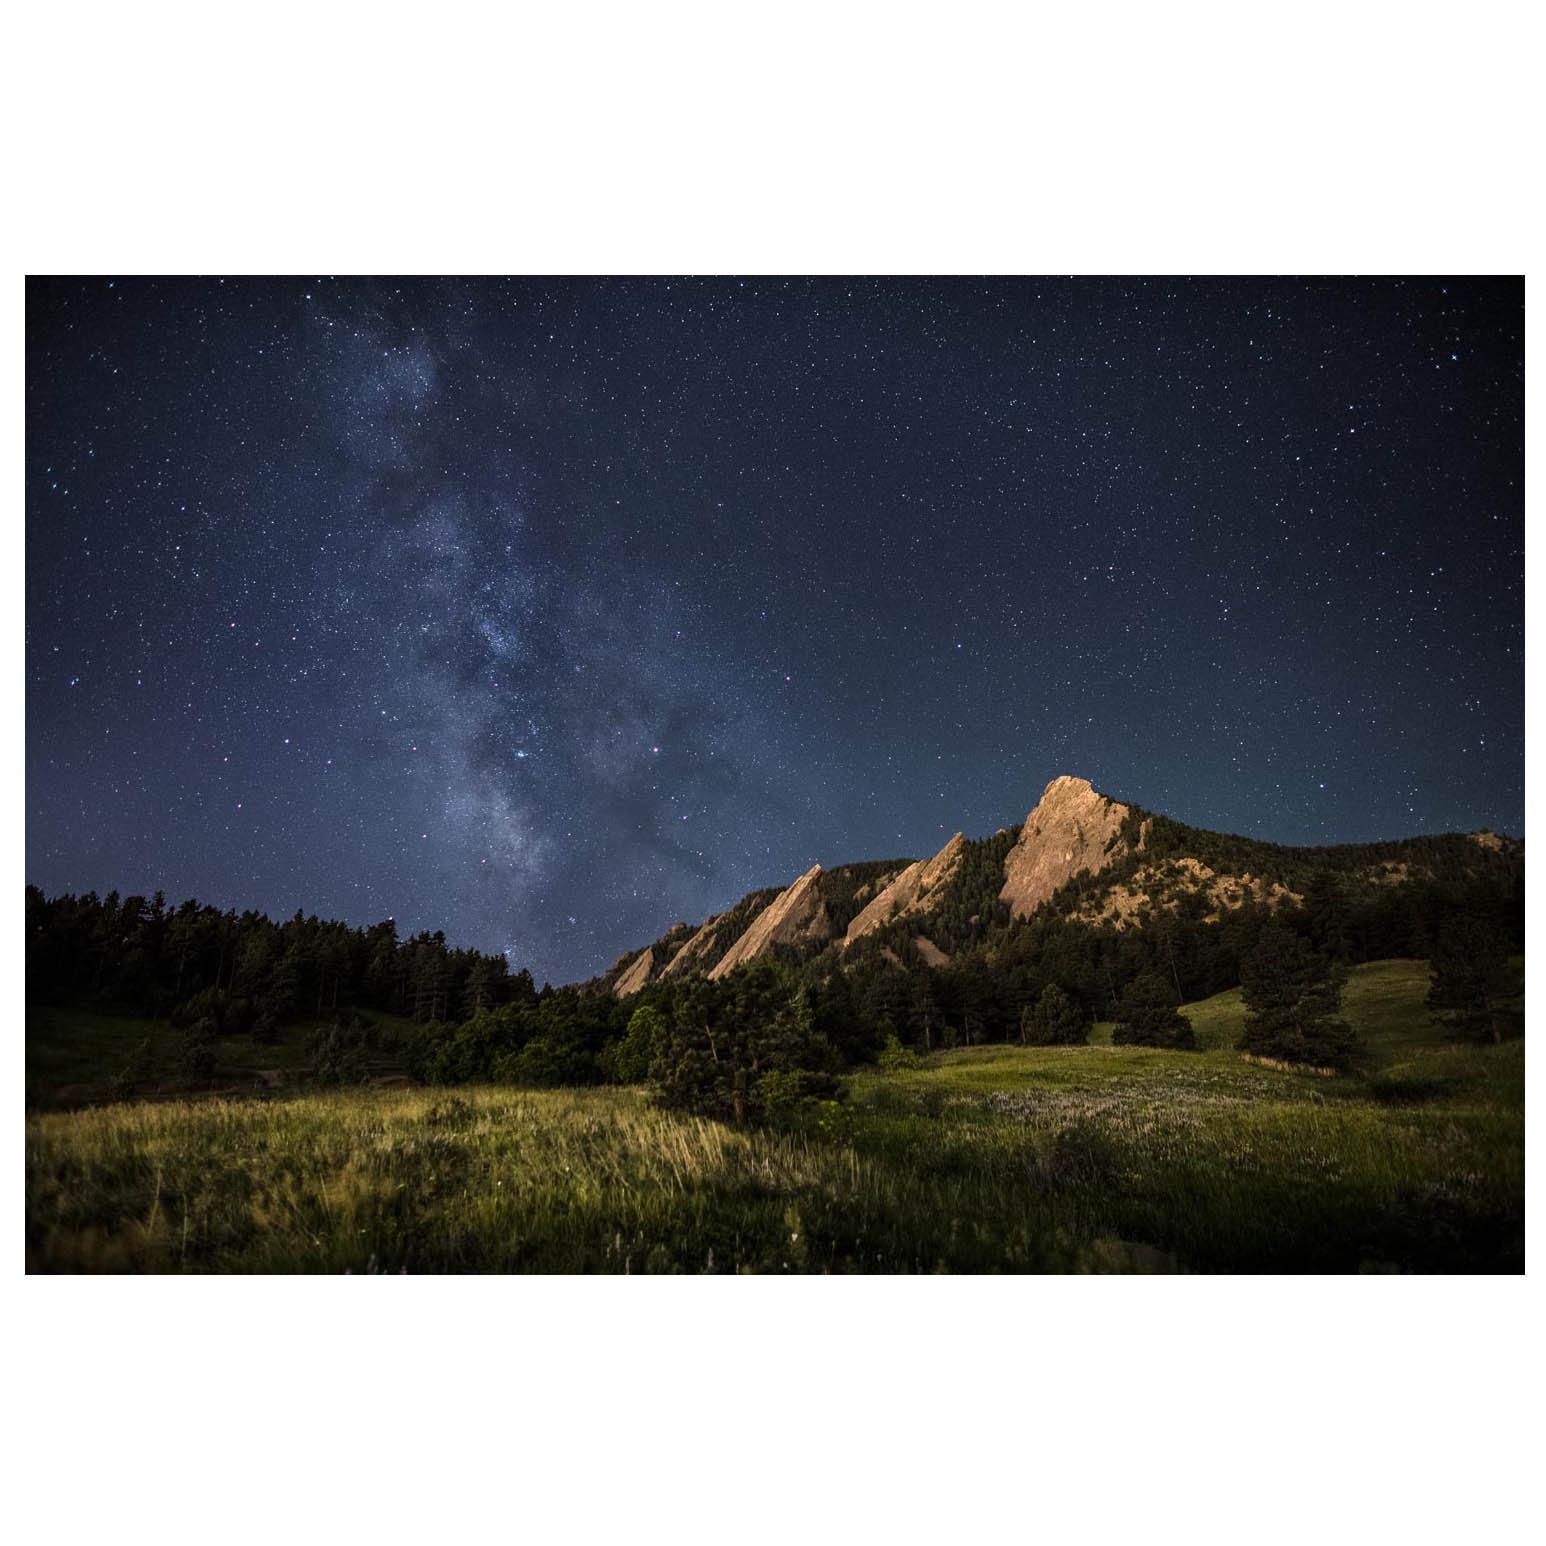 Cullis unframed - Flatiron Milky Way cropped 2